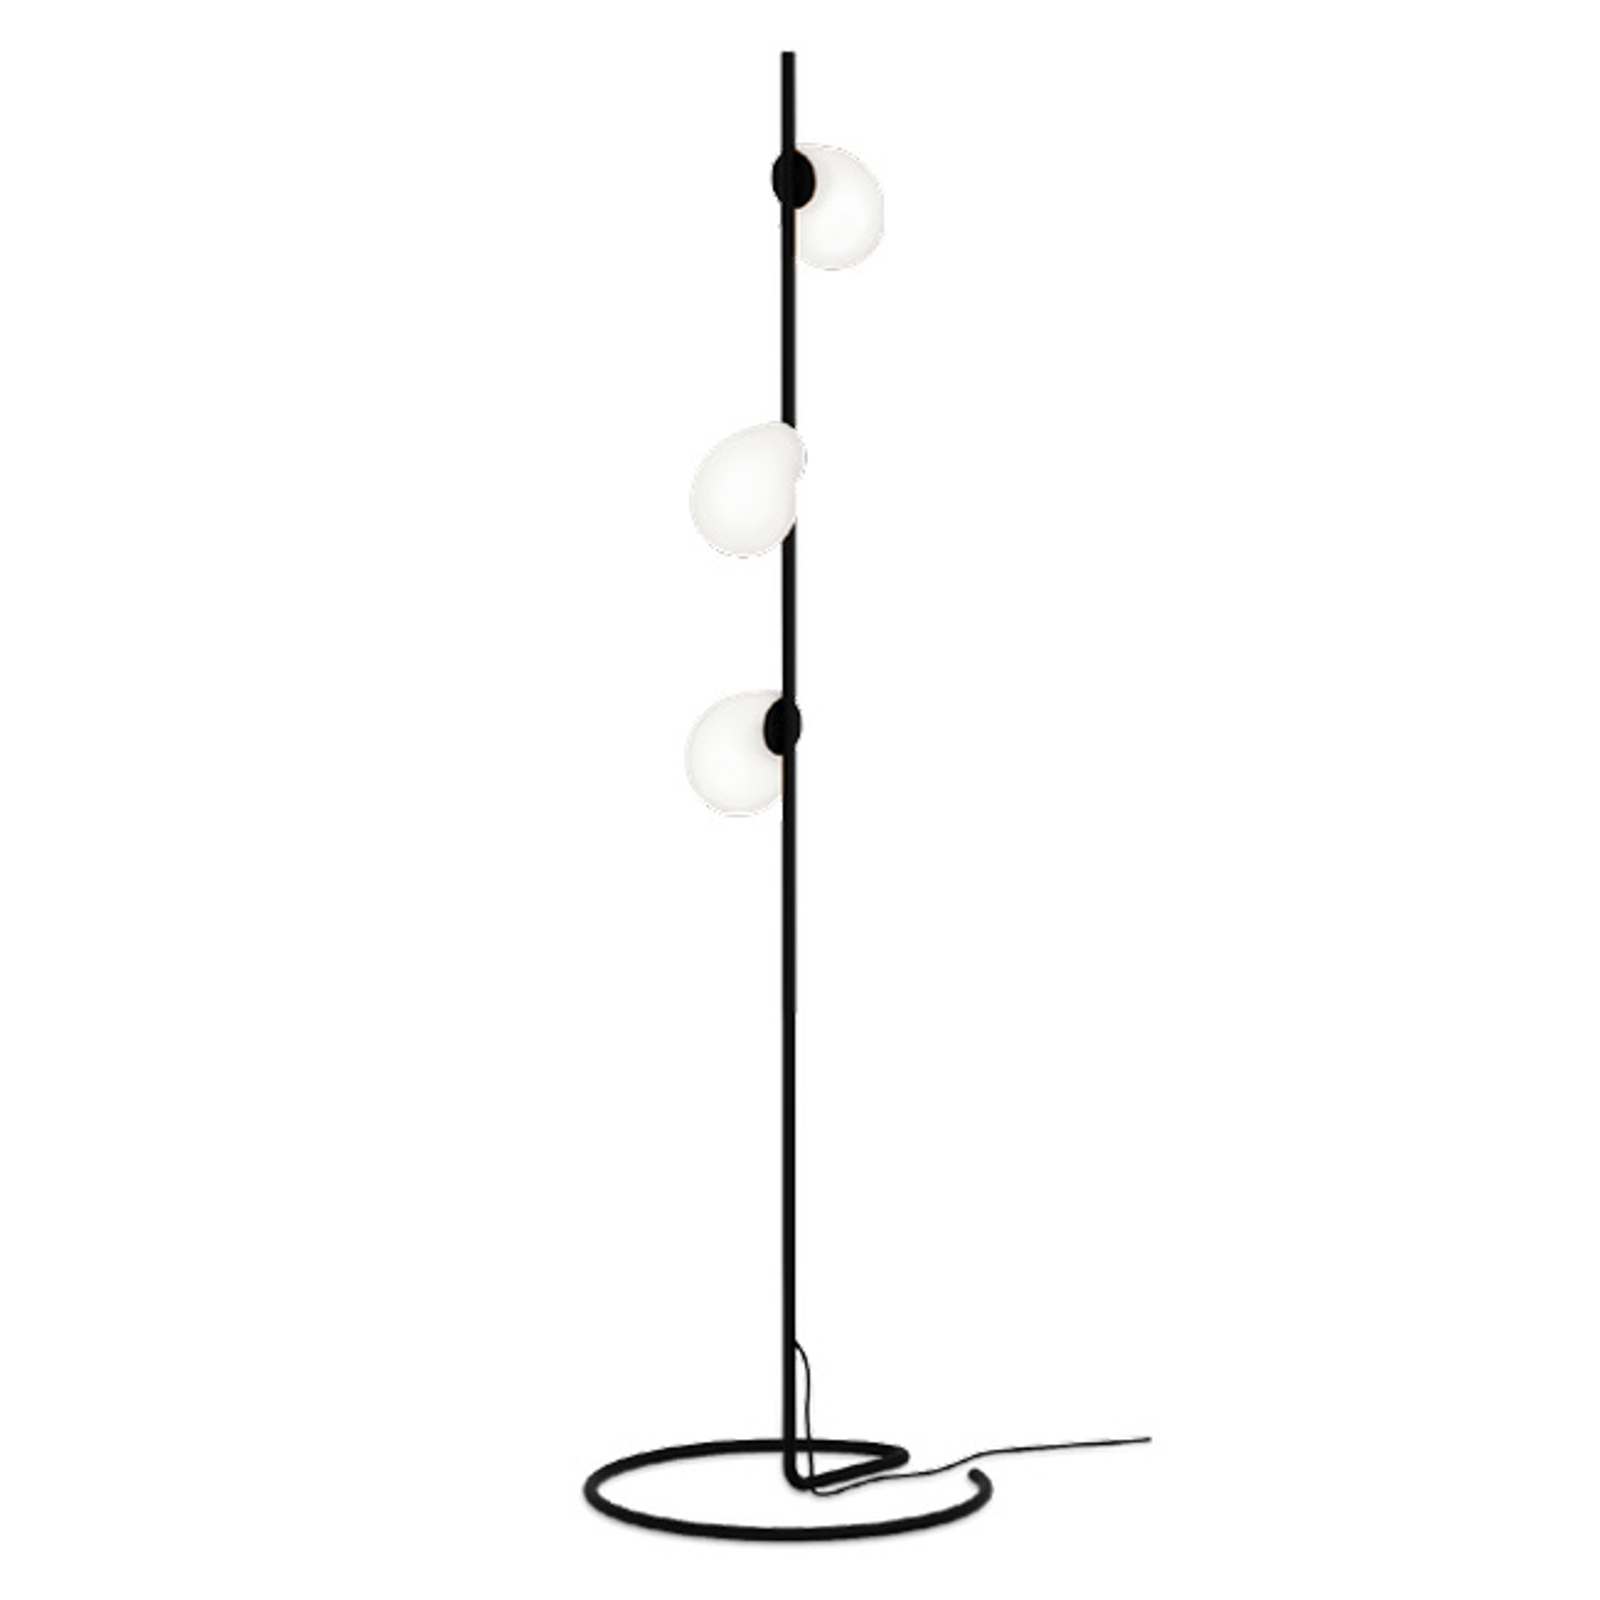 WEVER & DUCRÉ Dro 1.0 Comp vloerlamp zwart-wit